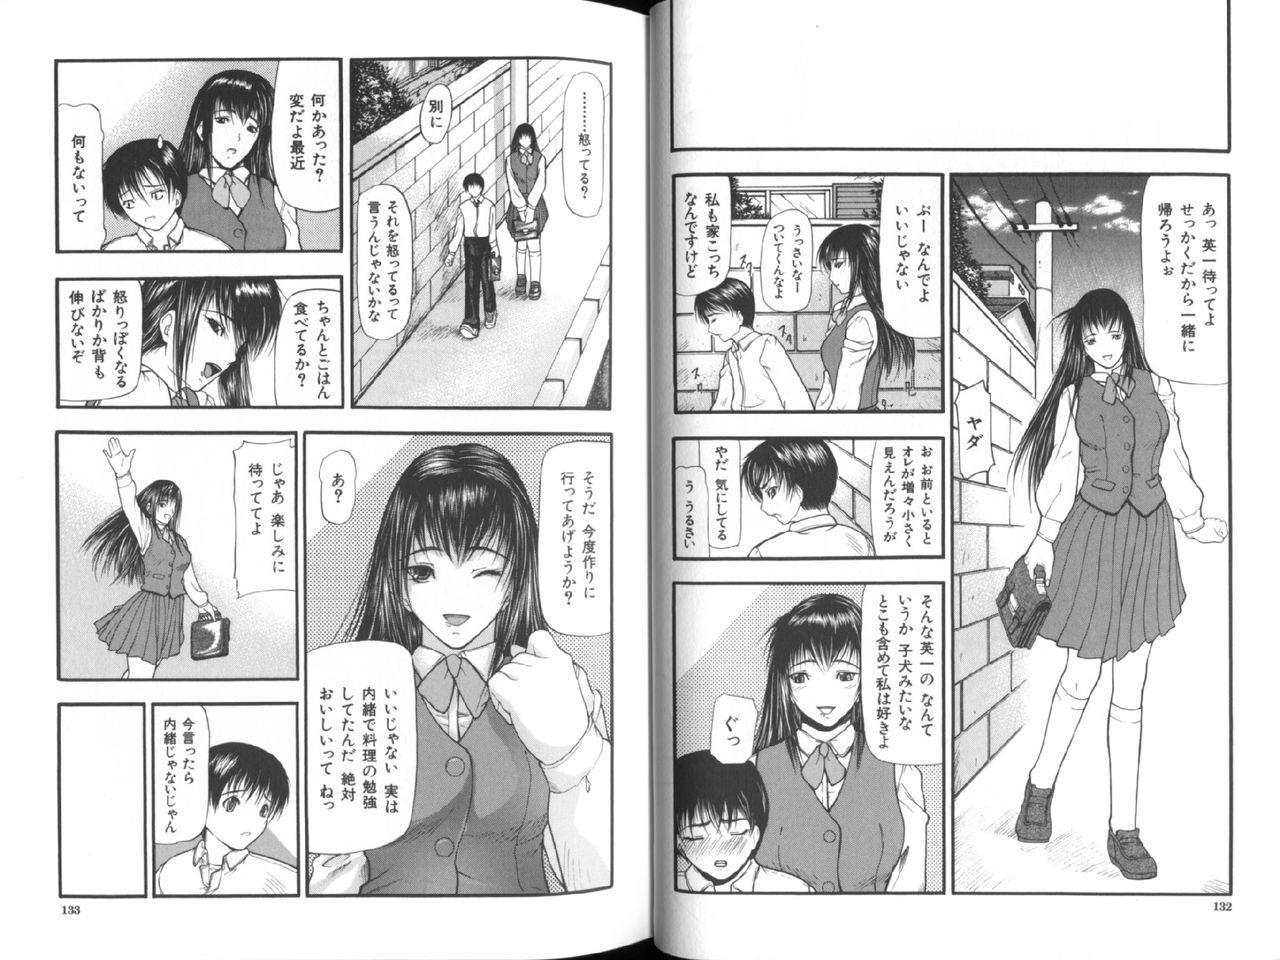 Senjou - A Desire is Instigated 67